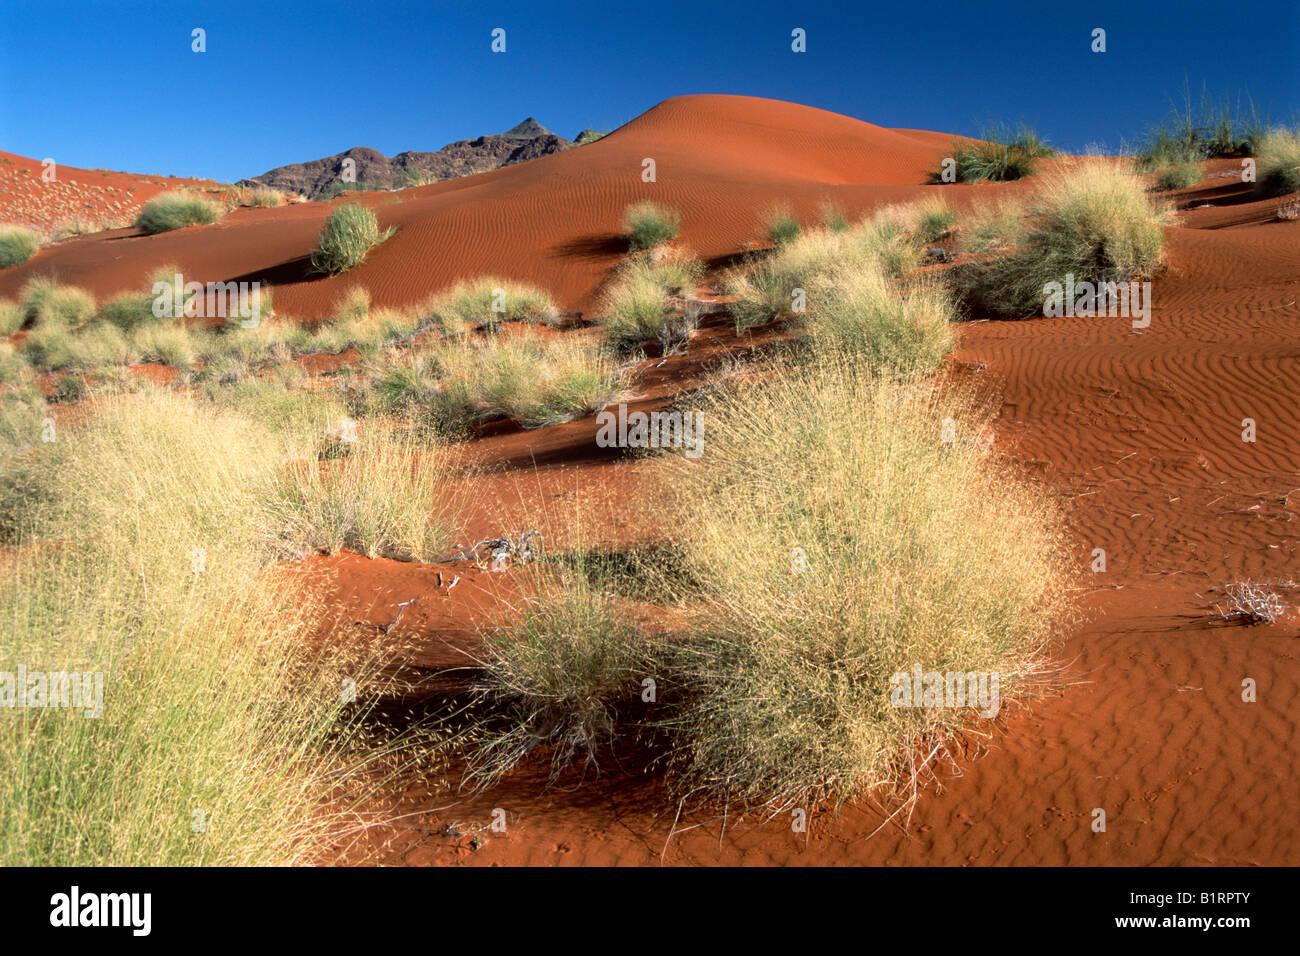 Dune landscape in the Namibian desert, Namib-Naukluft National Park, Namibia, Africa - Stock Image